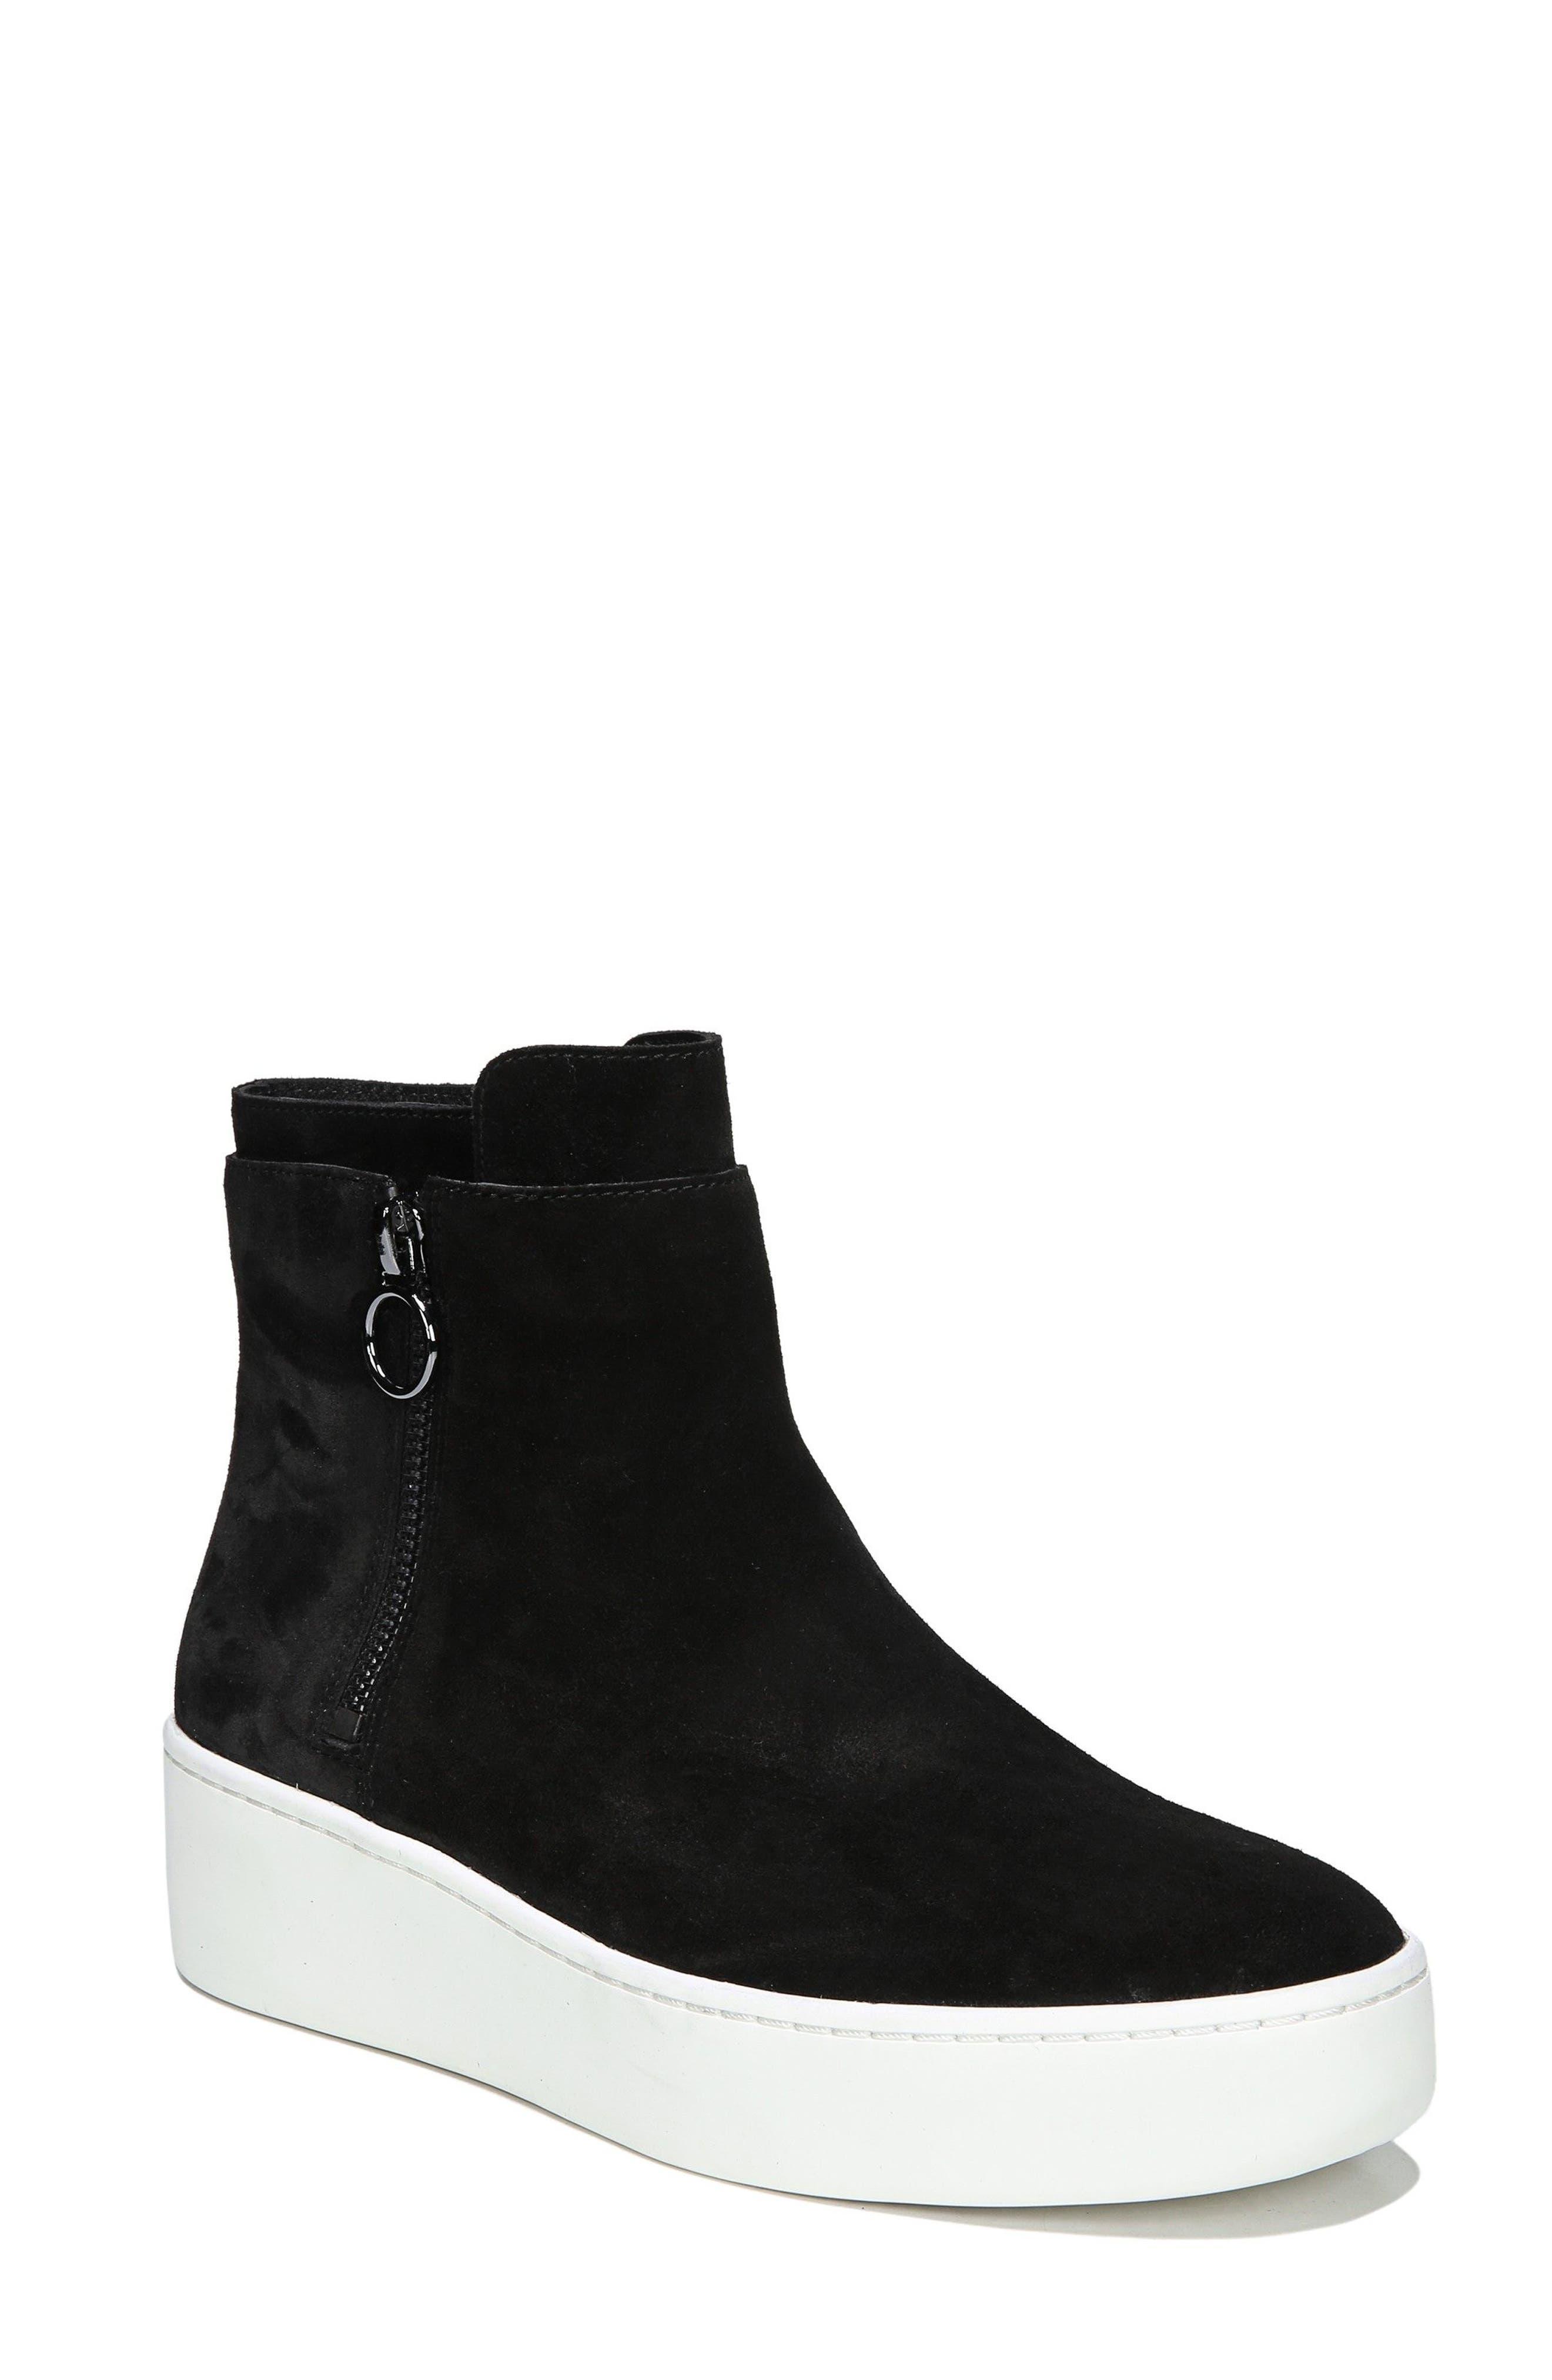 Easton High Top Sneaker,                             Main thumbnail 1, color,